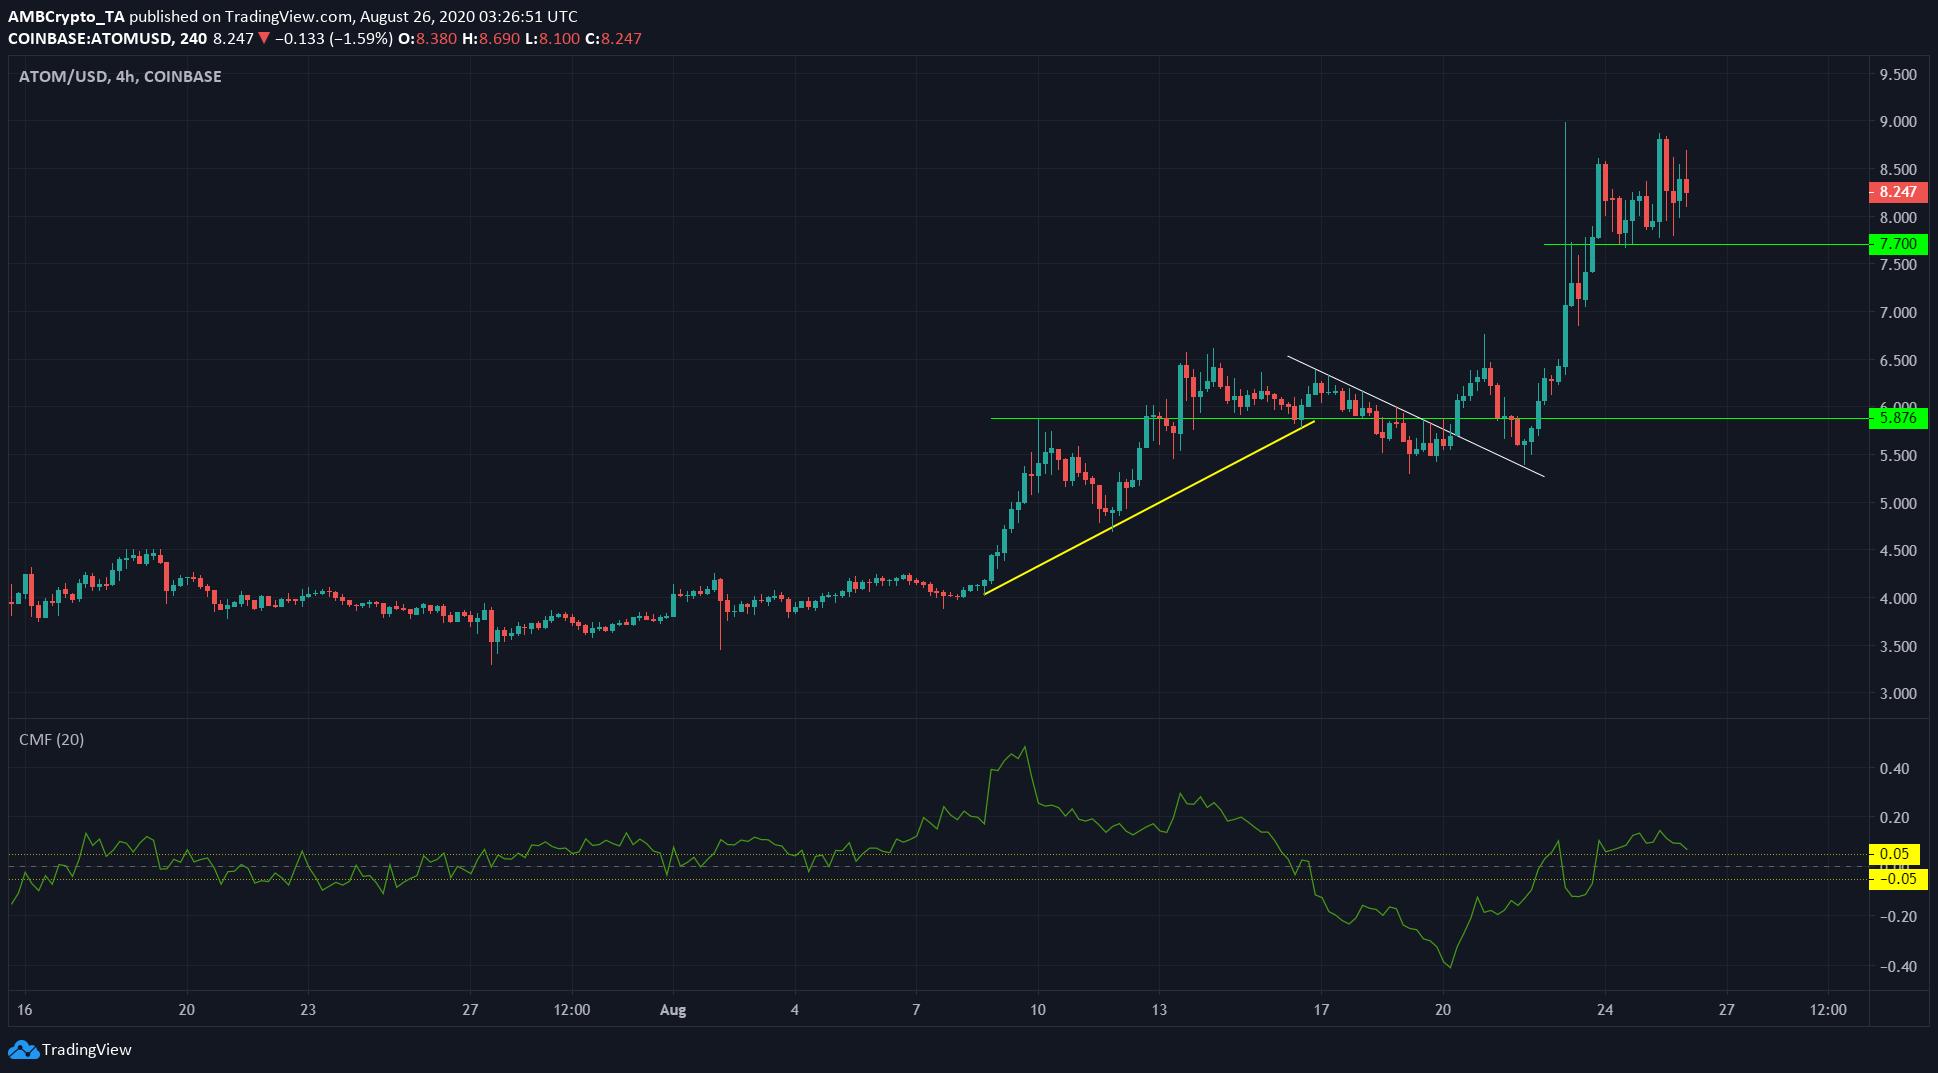 Bitcoin SV, Tezos, Cosmos Price Analysis: 26 August